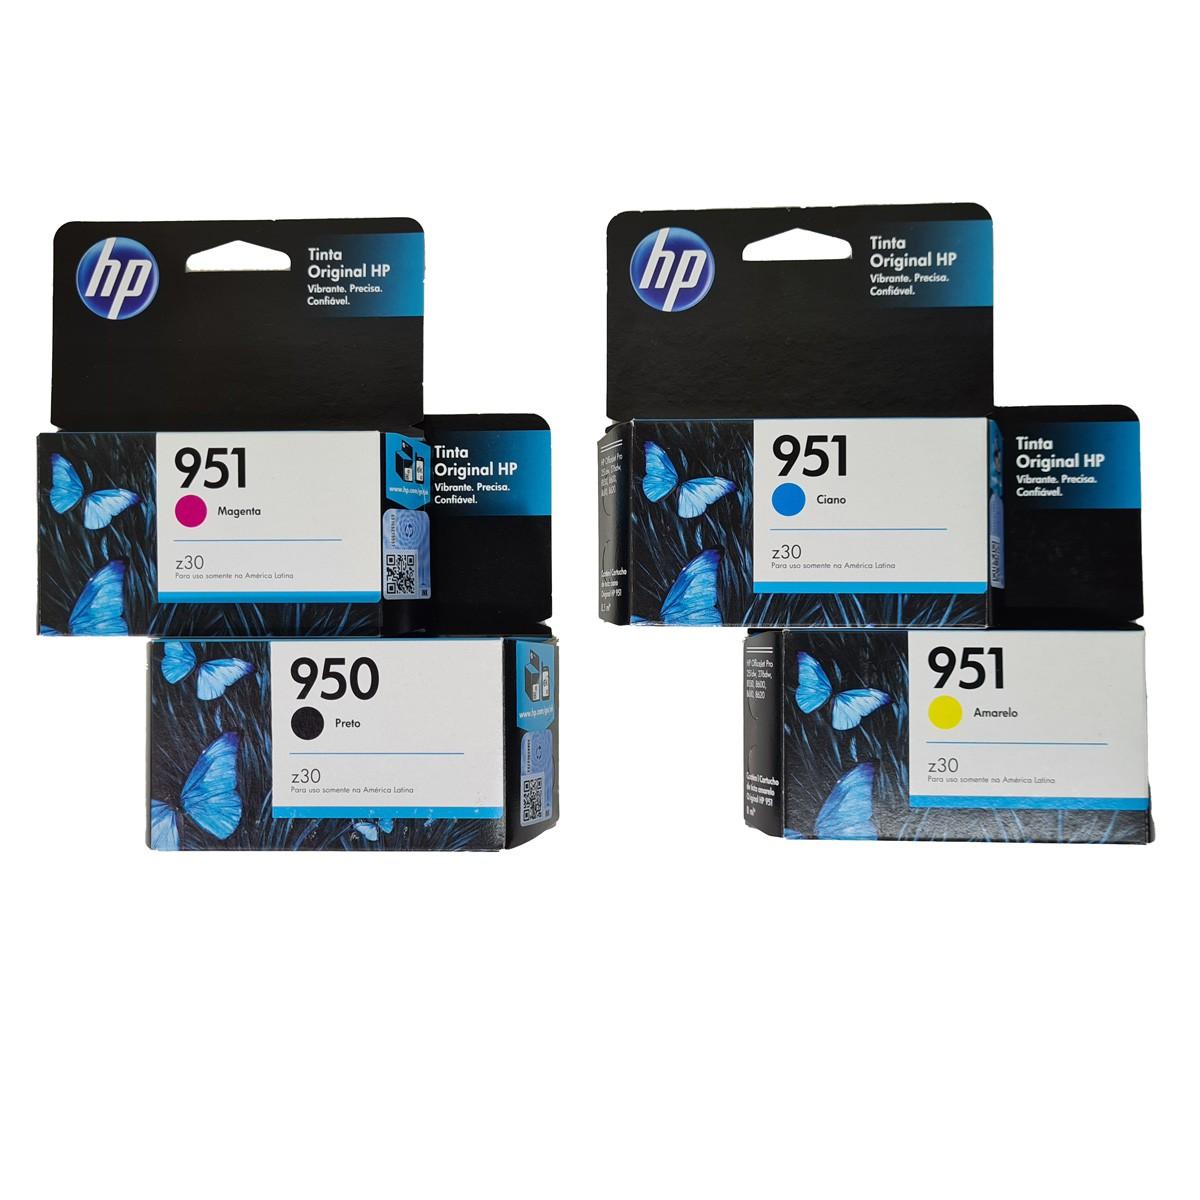 Kit 4 Cartucho HP 950 e 951 para OfficeJet pro 8100 8600 pro8600